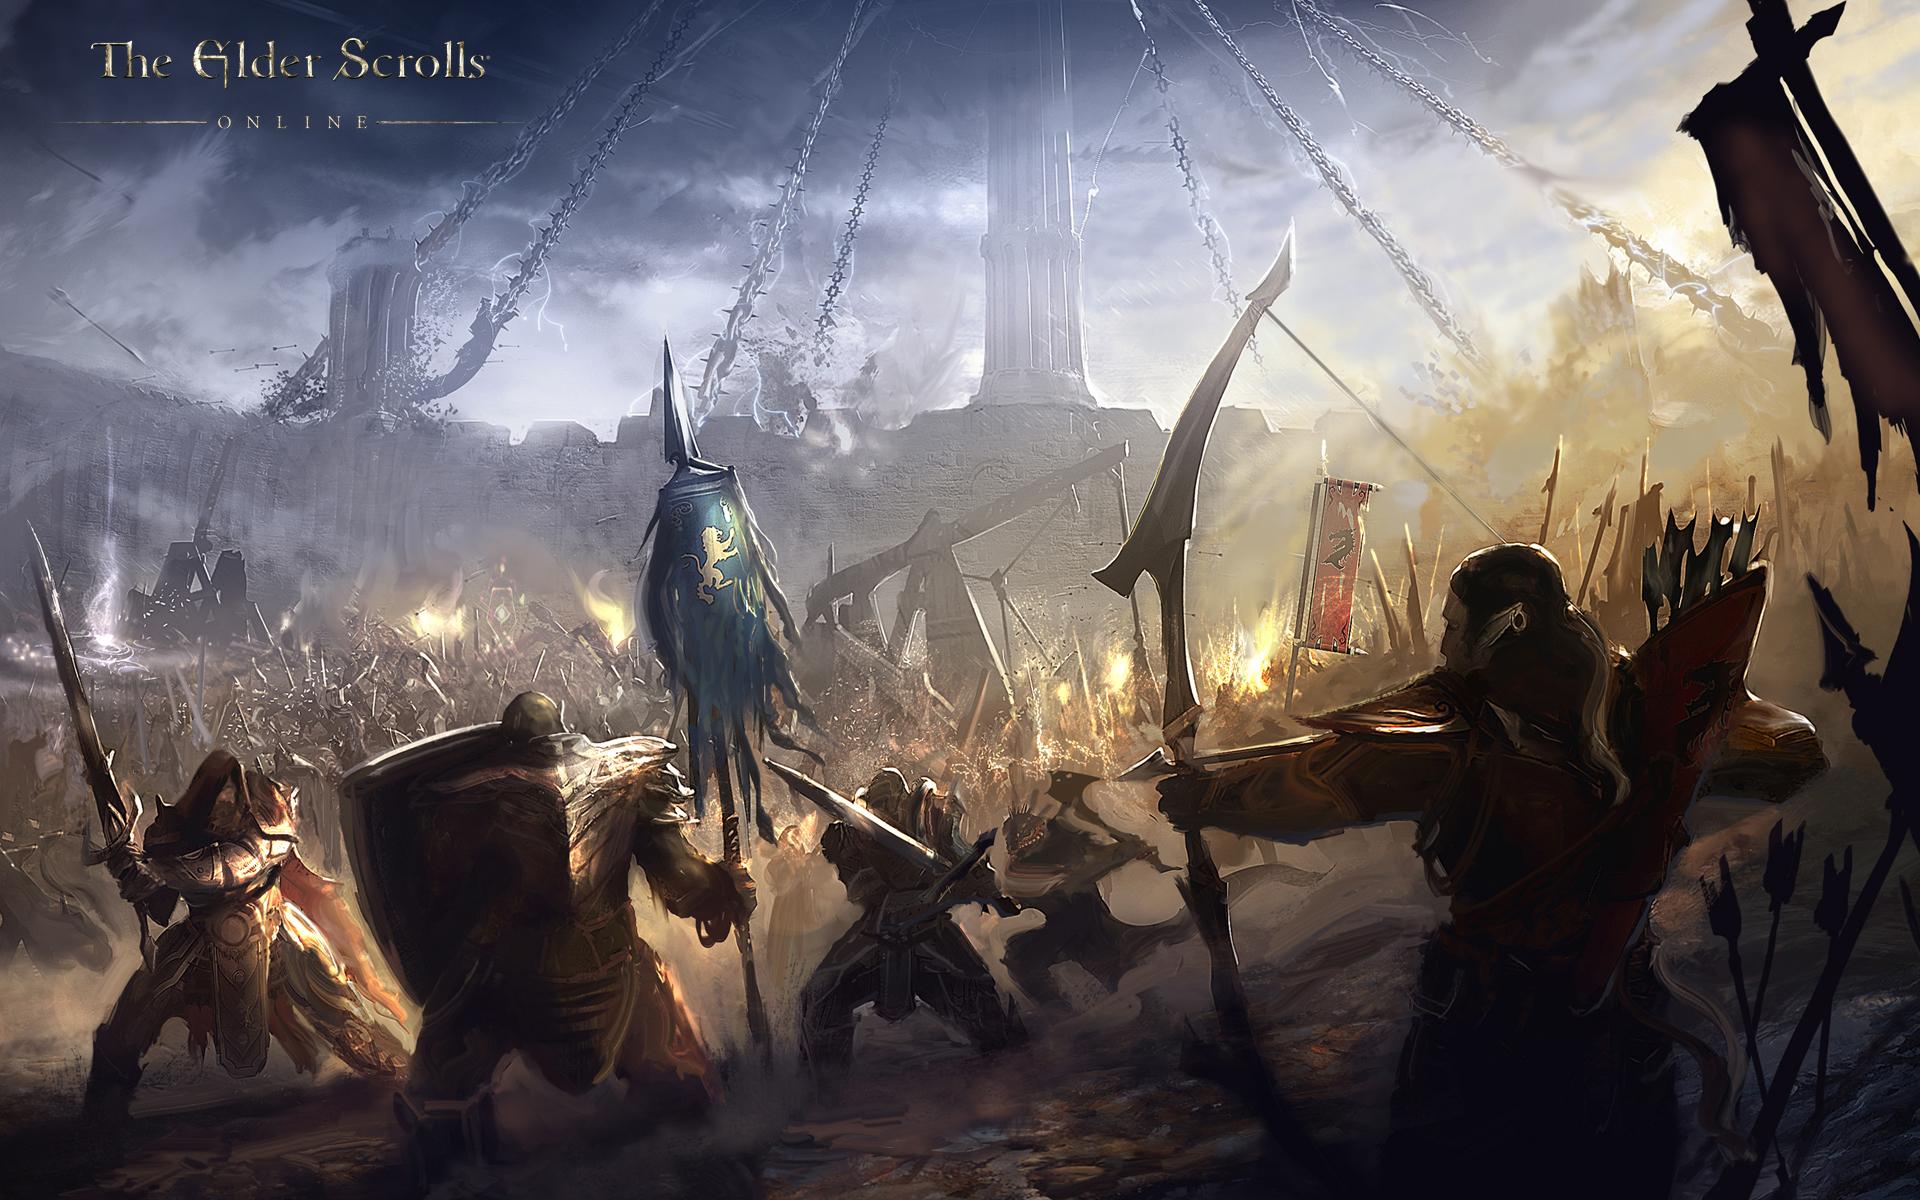 Free Download The Elder Scrolls Online Wallpaper Concept Art